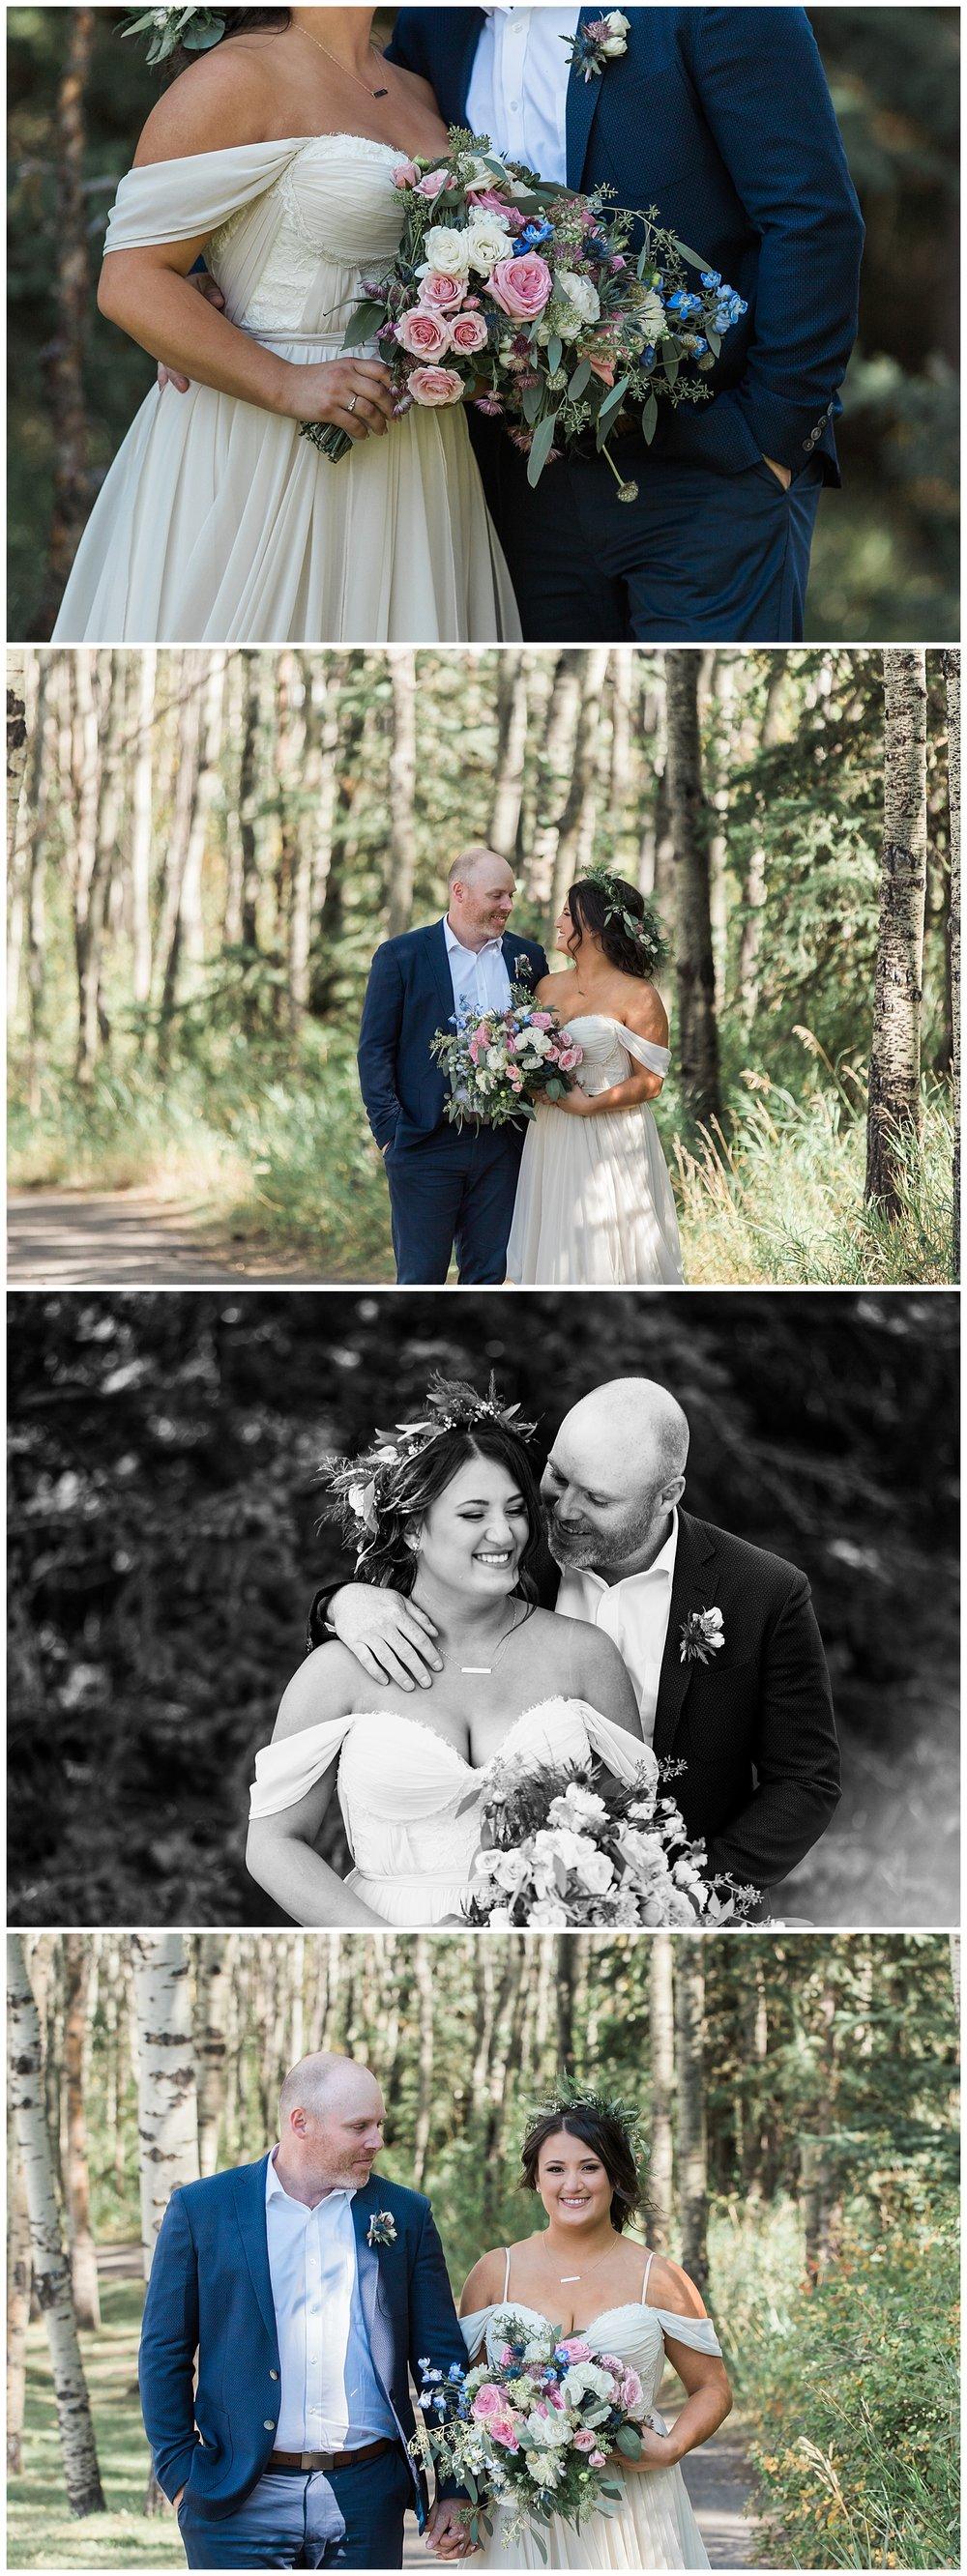 Calgary-wedding-photographer-springbank-links-golf-course-_0010.jpg